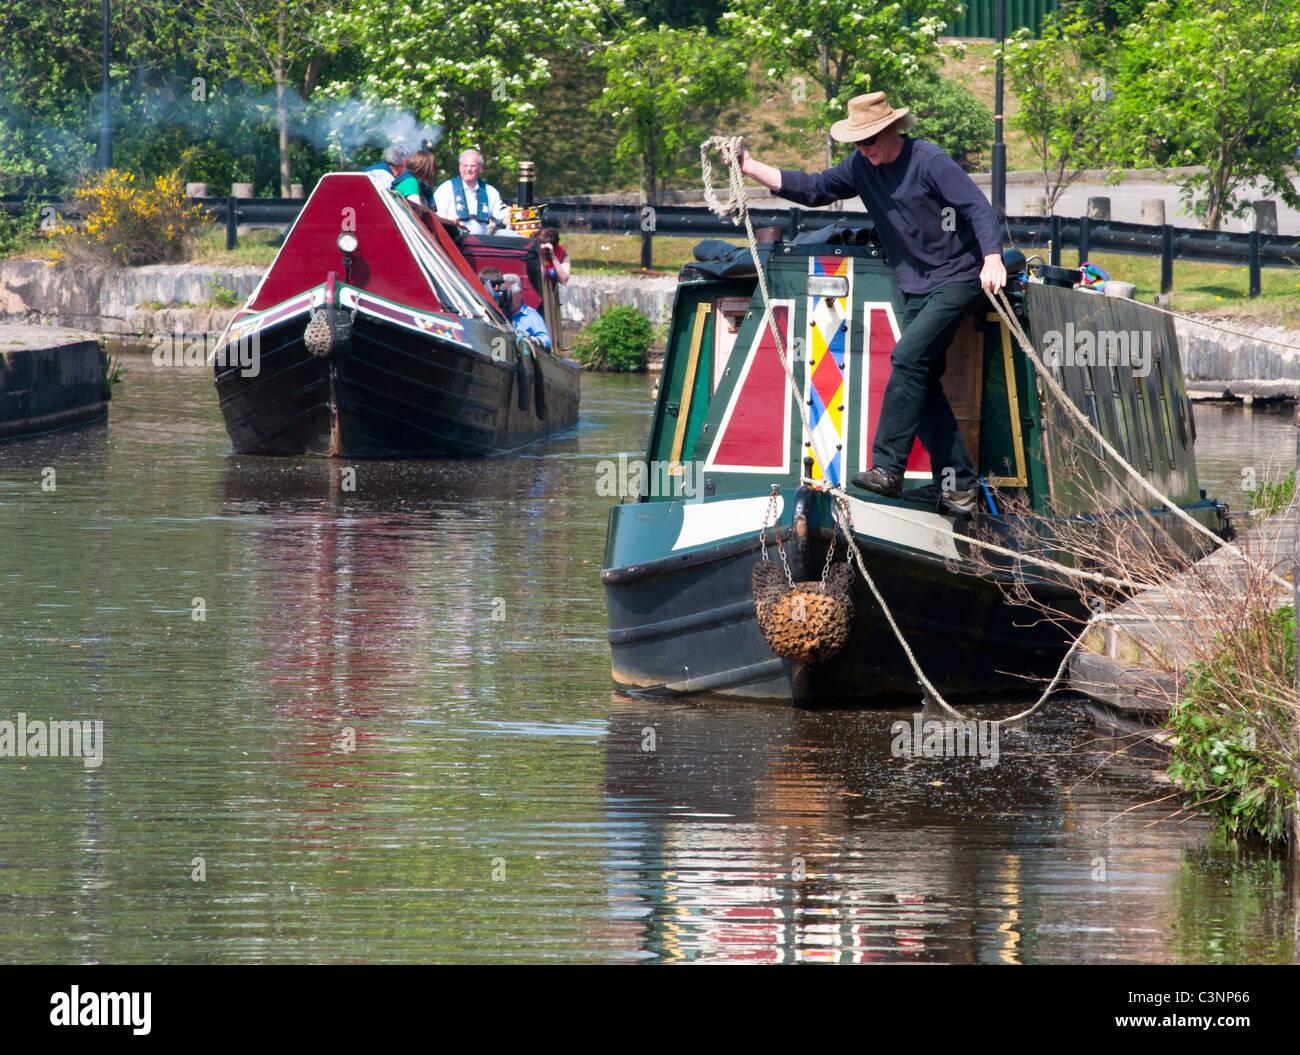 Boats on Stoke on Trent canal near Middleport pottery factory, Staffs. UK - Stock Image